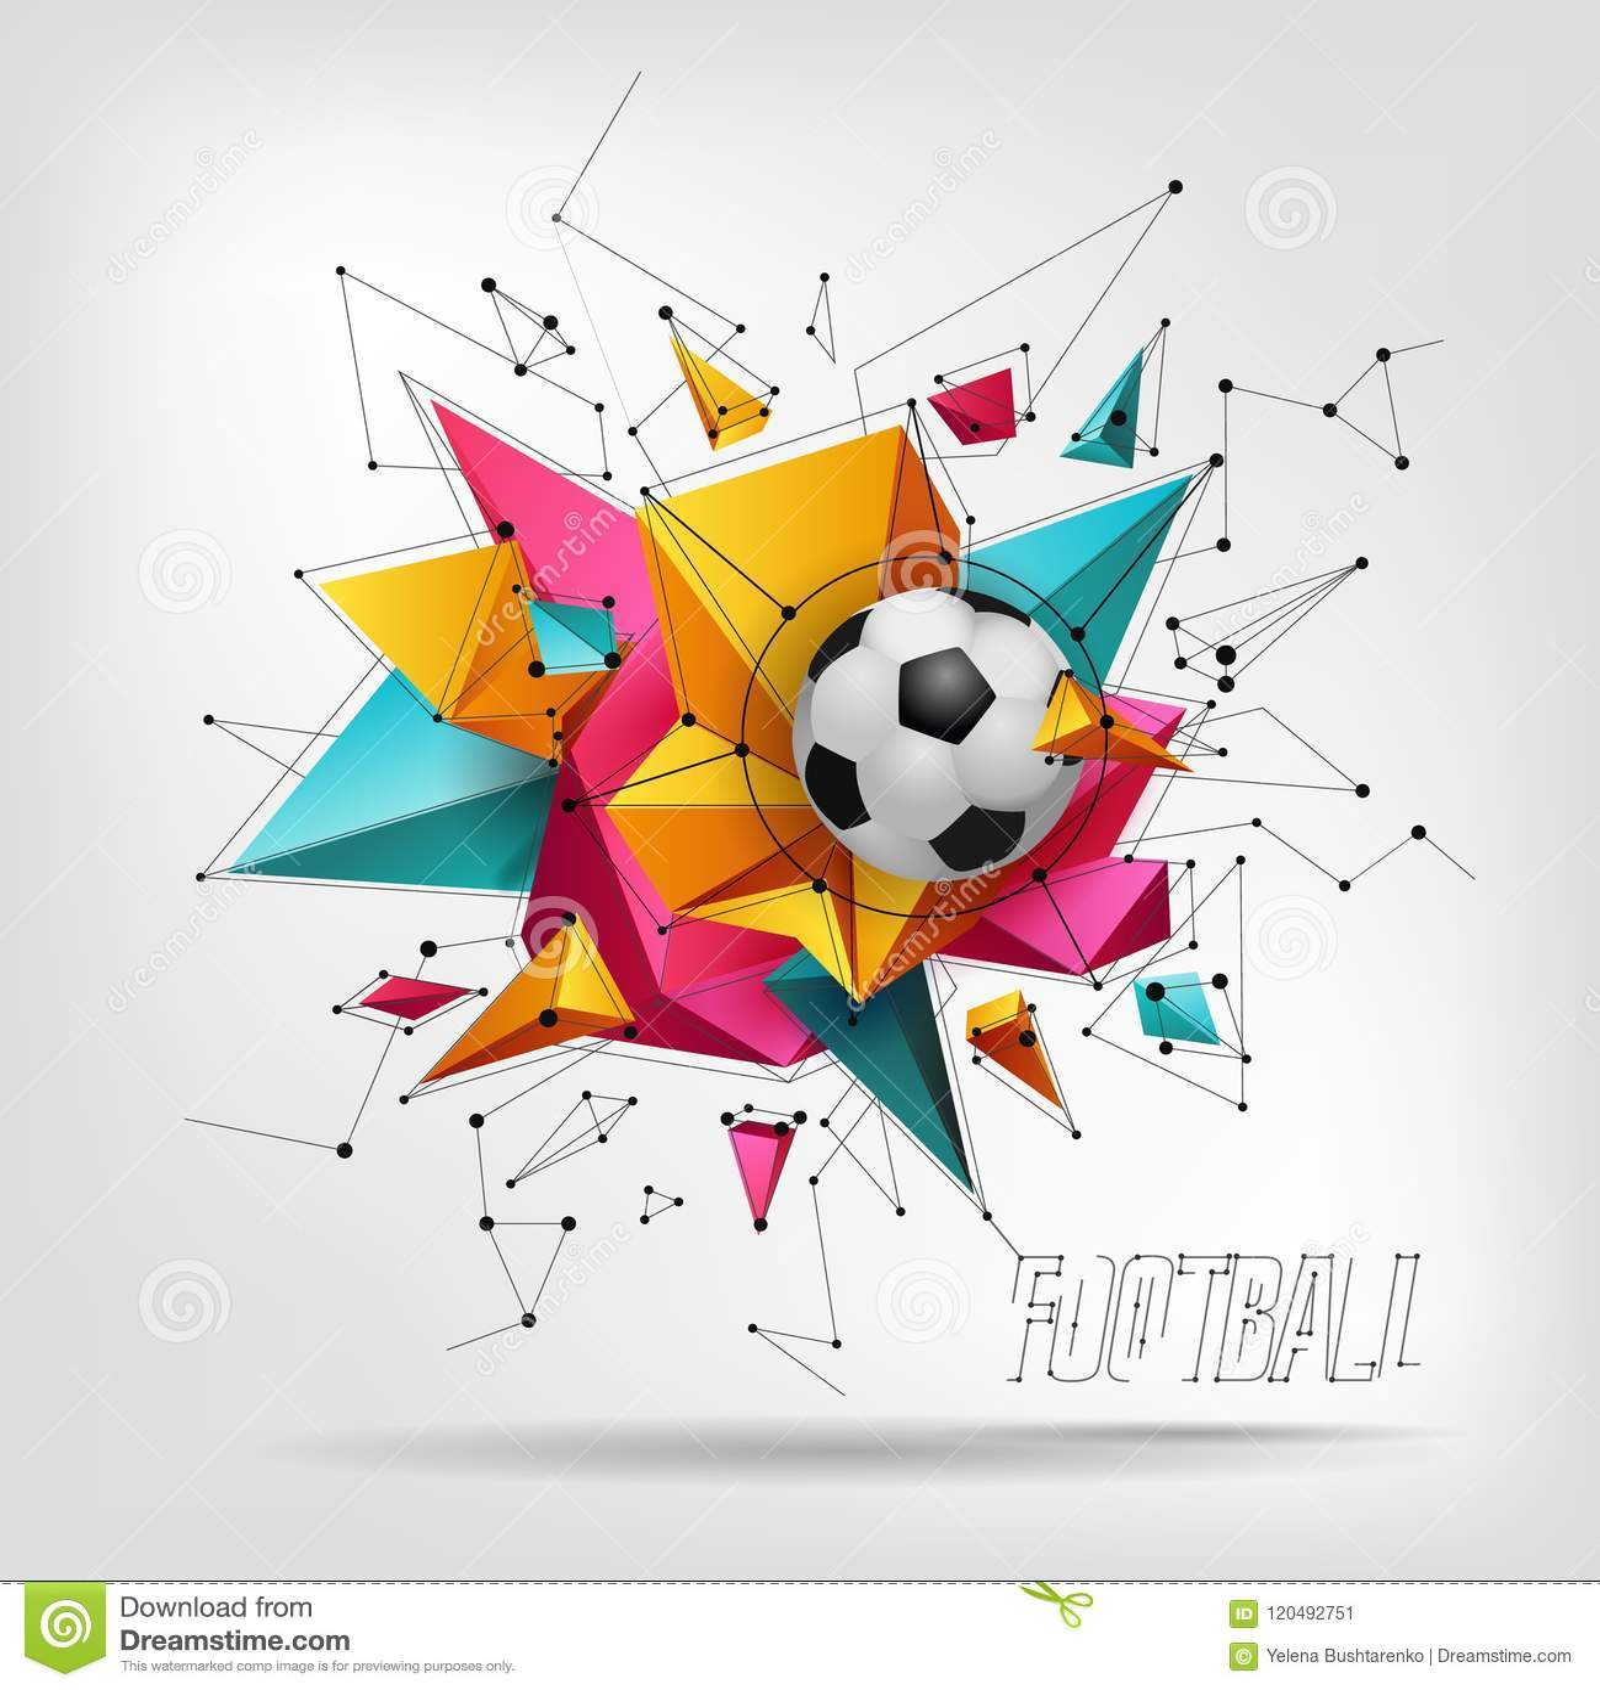 Origami American Football Ball 折り紙 アメリカンフットボール - YouTube | 1390x1300